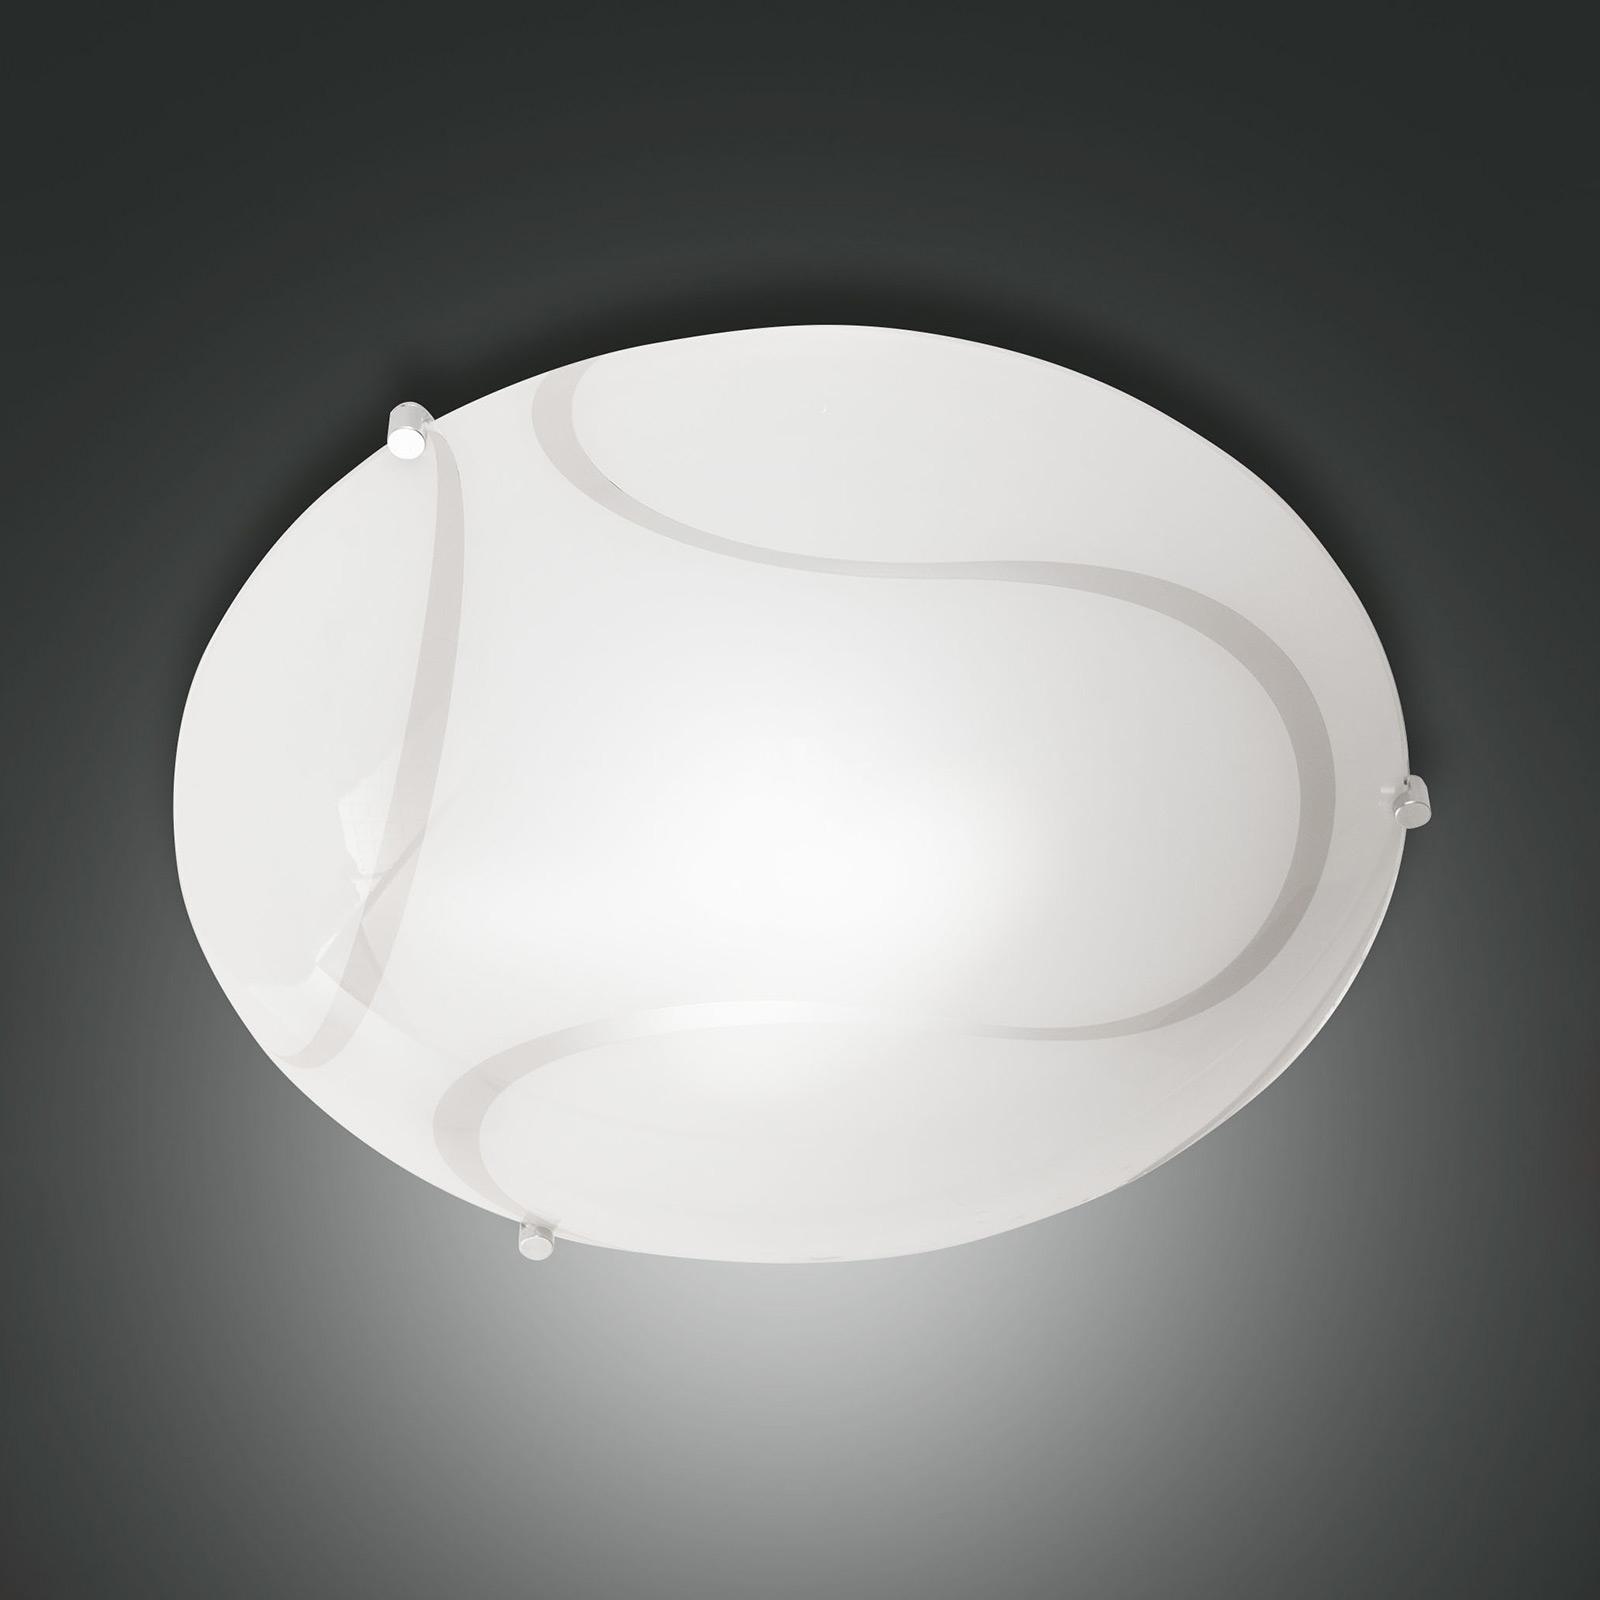 Plafondlamp Magma van glas, 30 cm